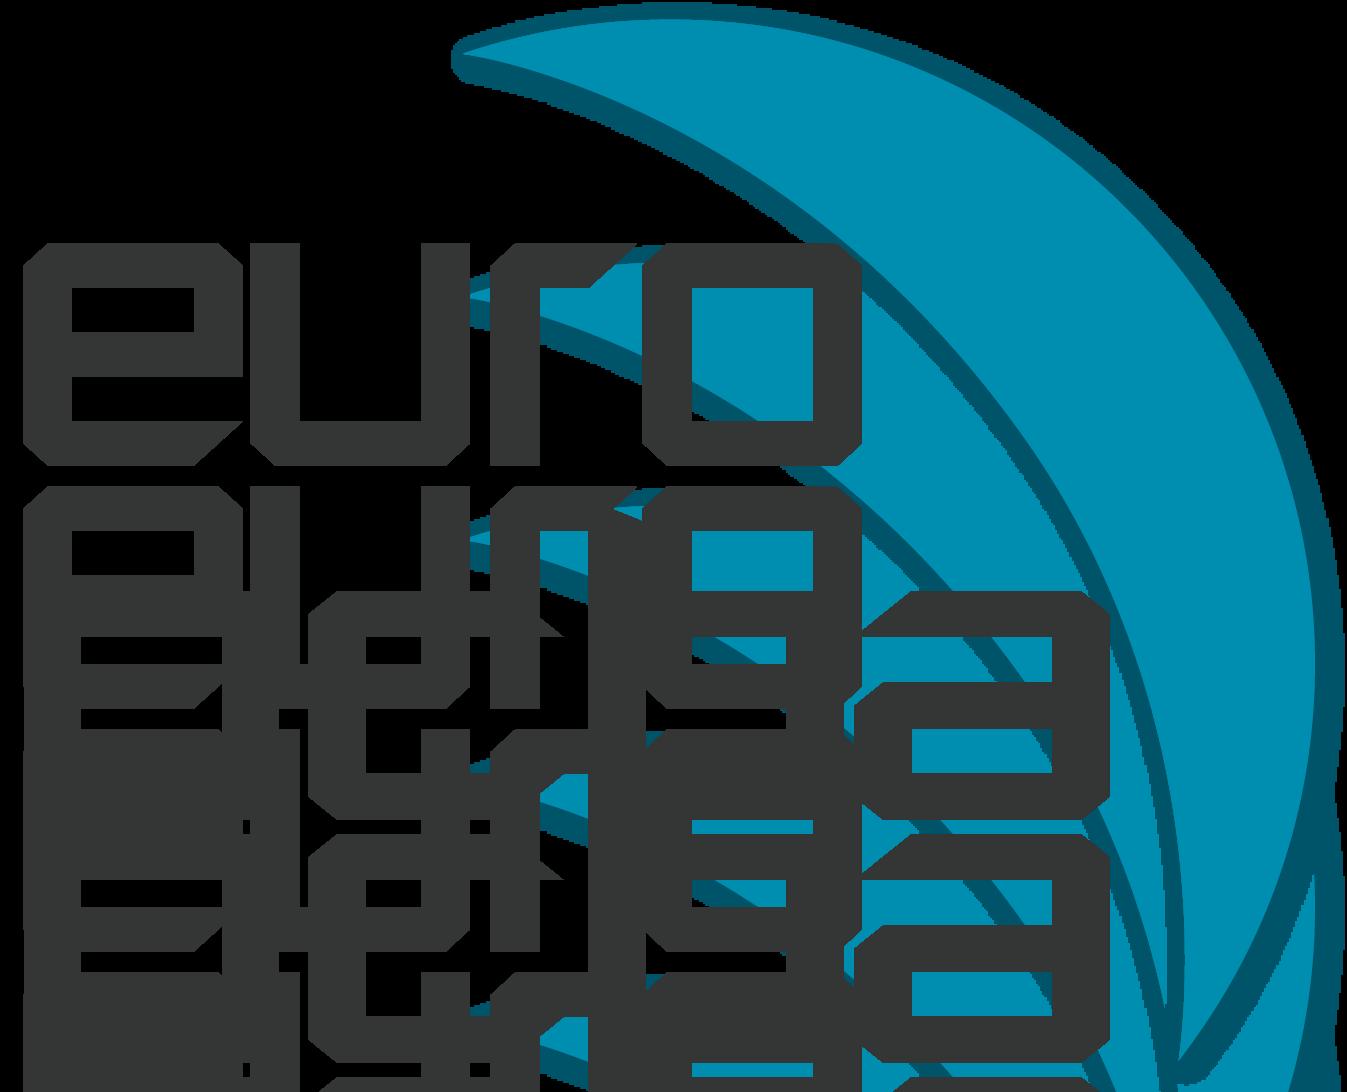 euro PCBA